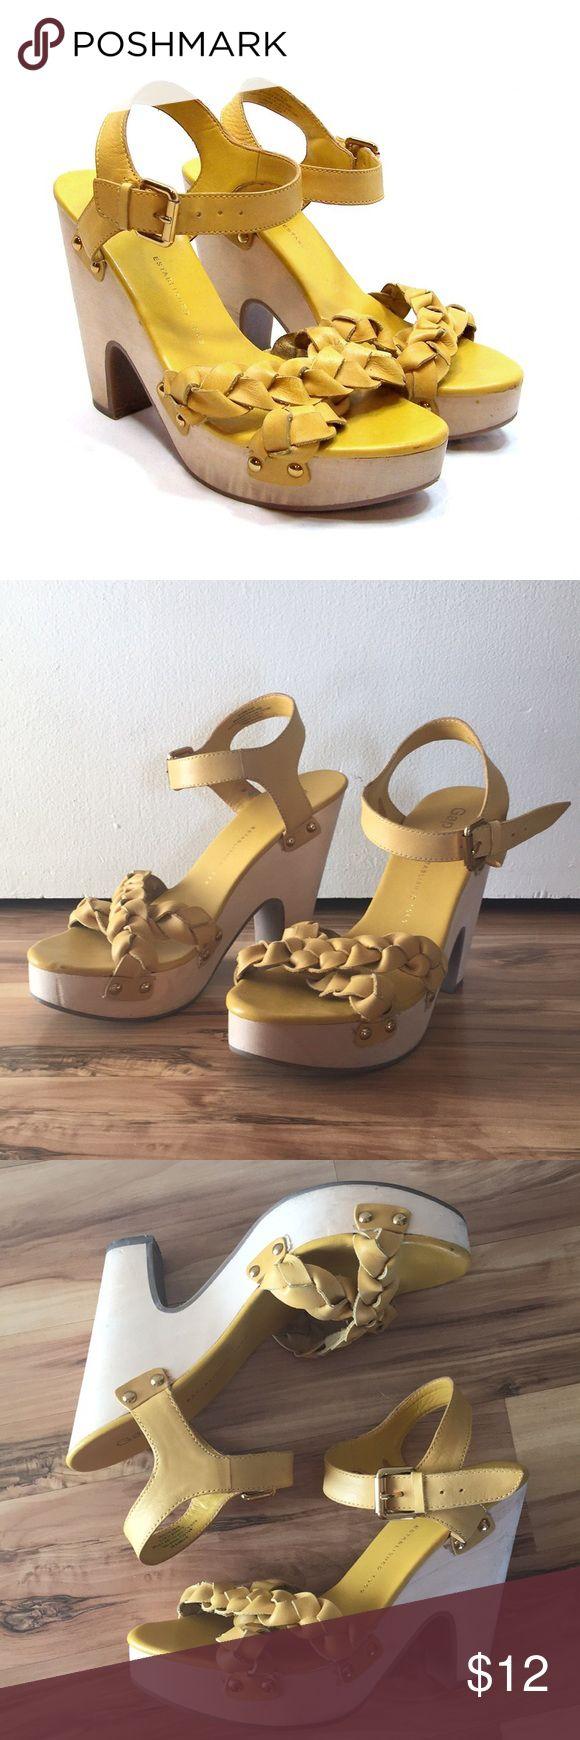 Gap Heels Mustard Gap block heels! Braided detail Used condition Some scuffs on heels (pictured) GAP Shoes Heels